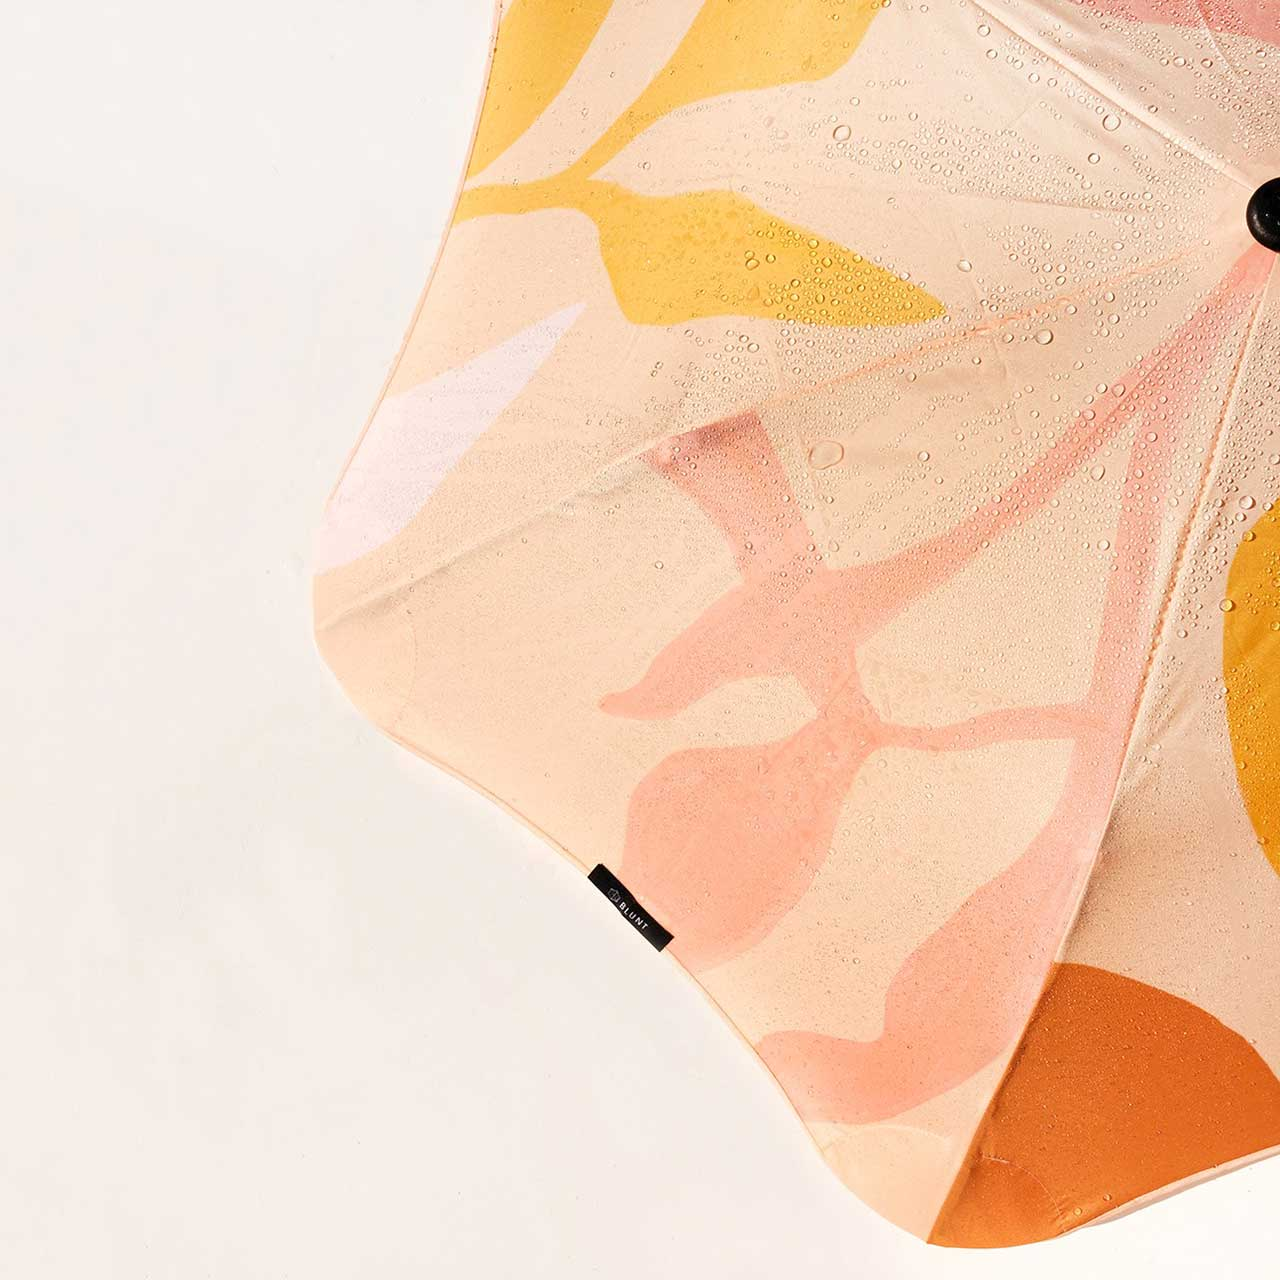 BLUNT umbrella Metro Ldt Ed Studio Jasmine | the design gift shop